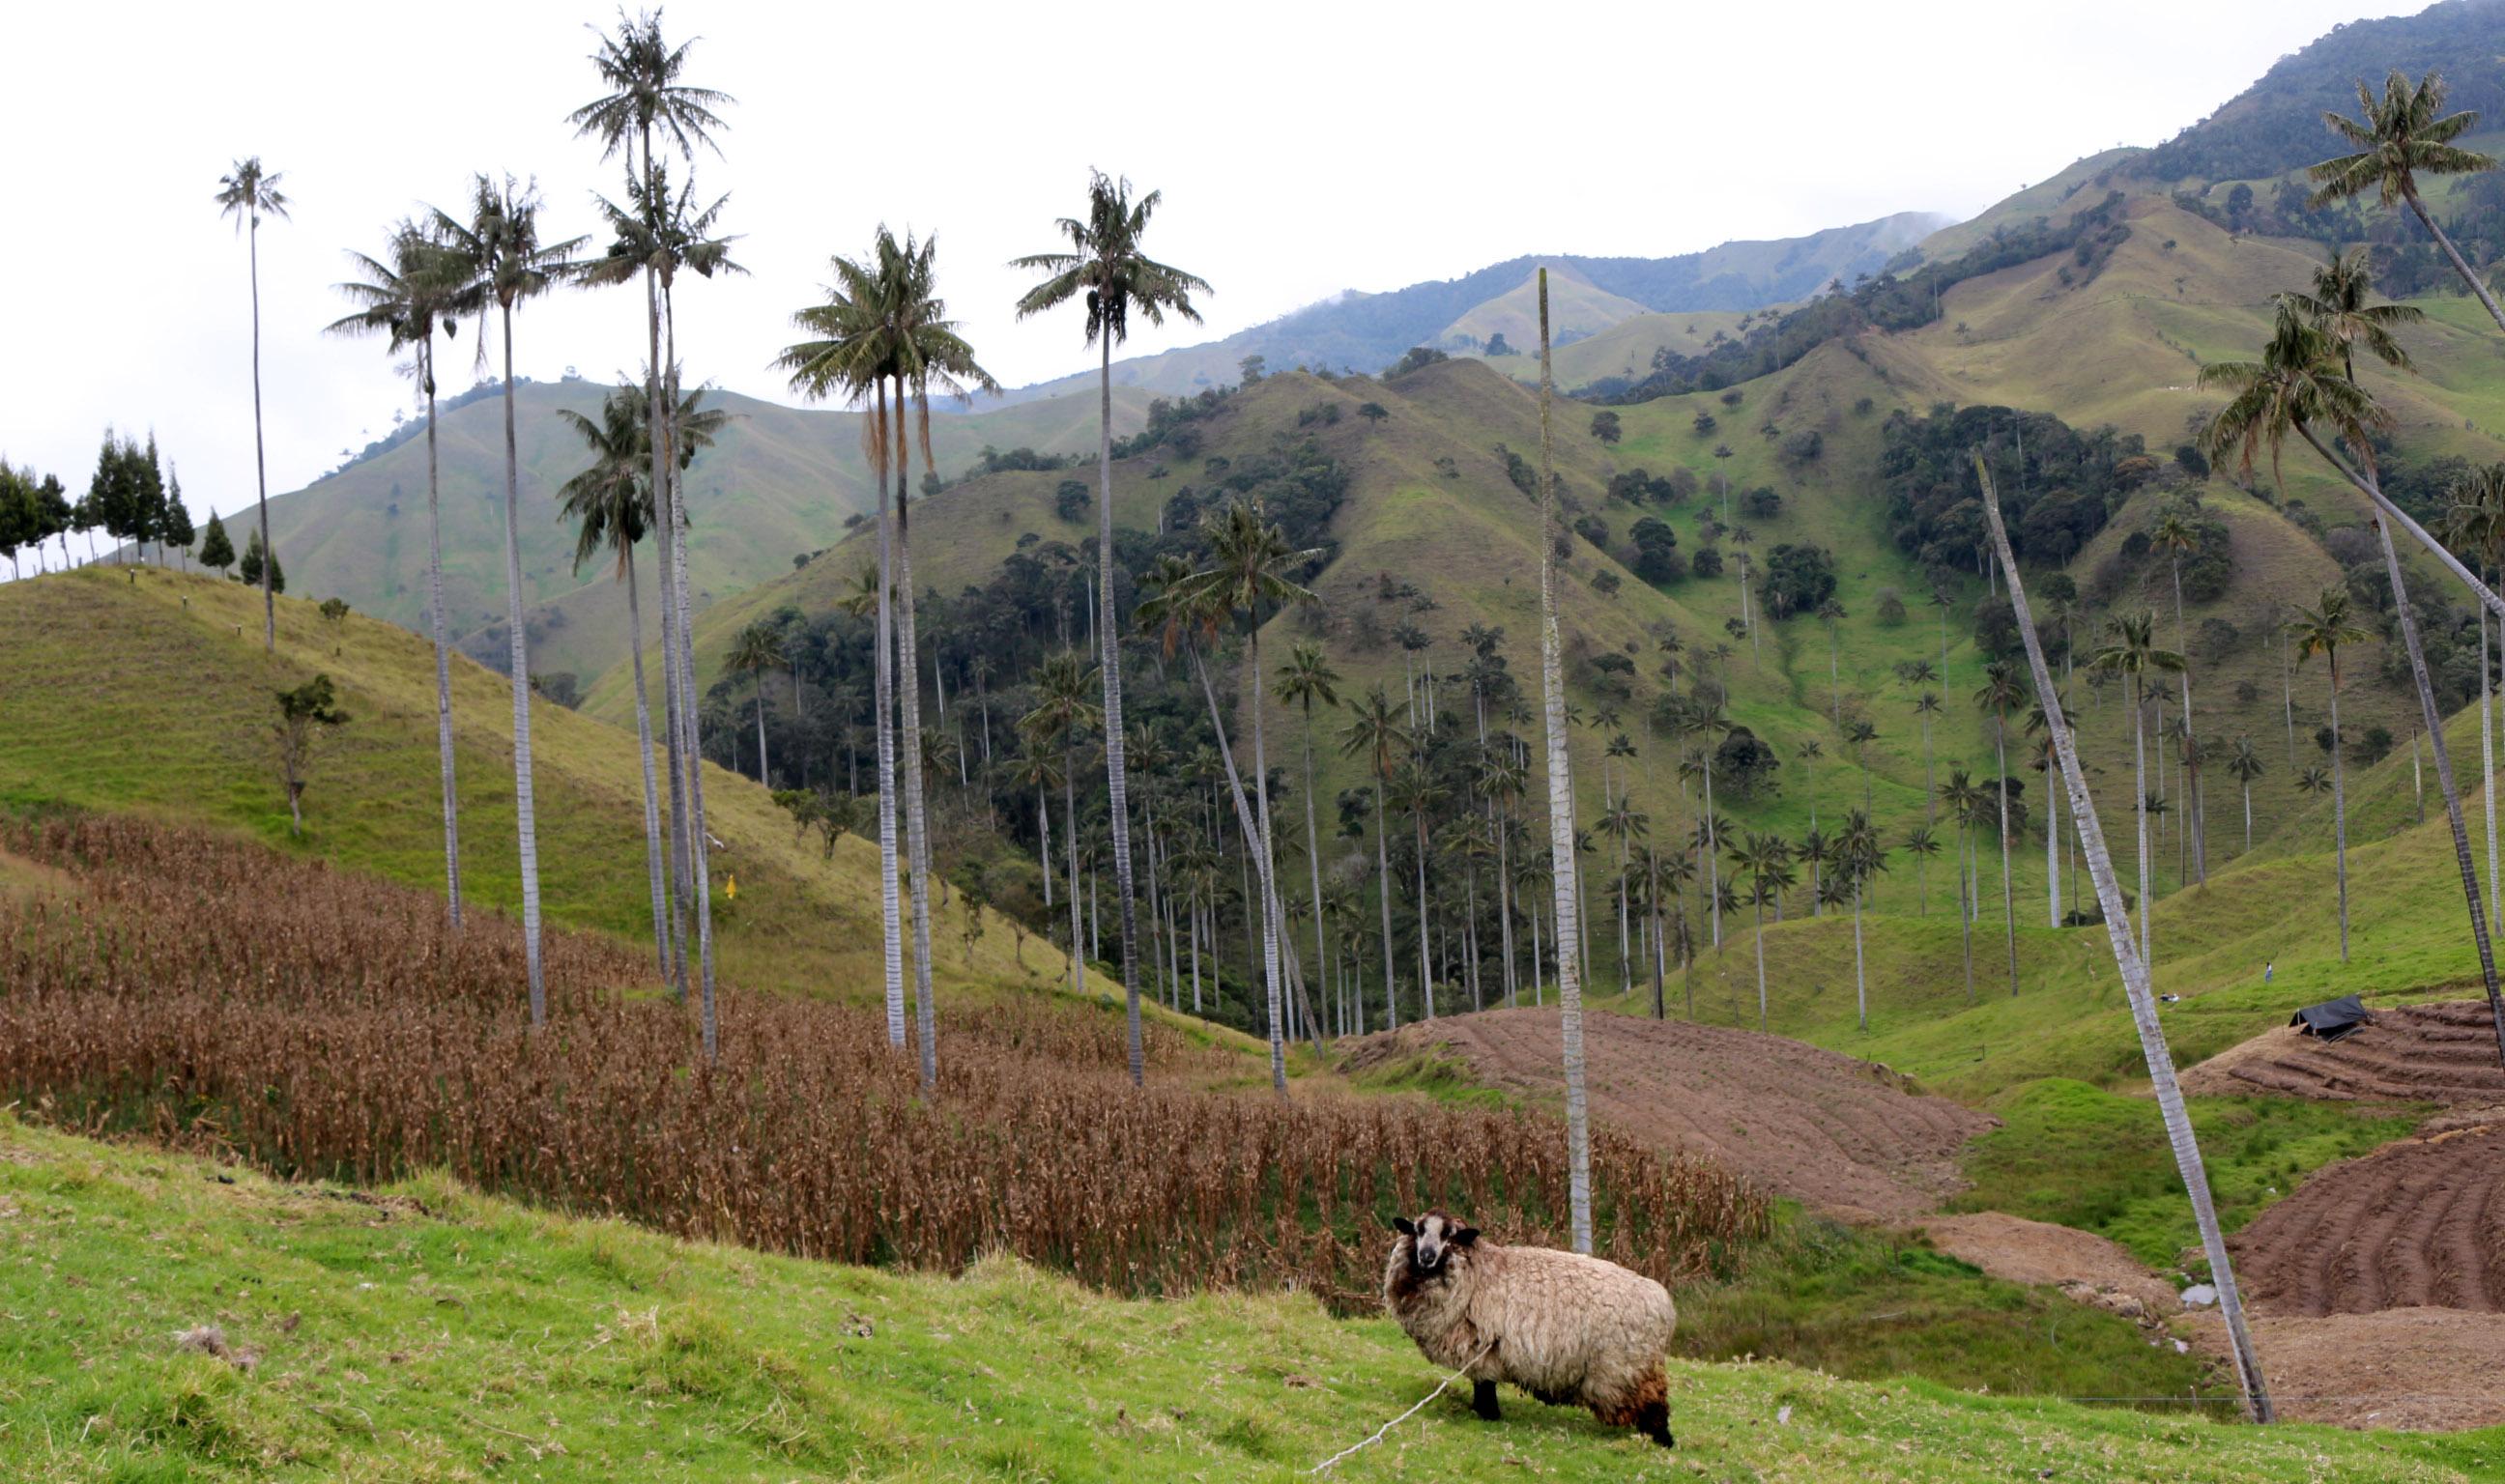 Les terres agricoles de San Felix